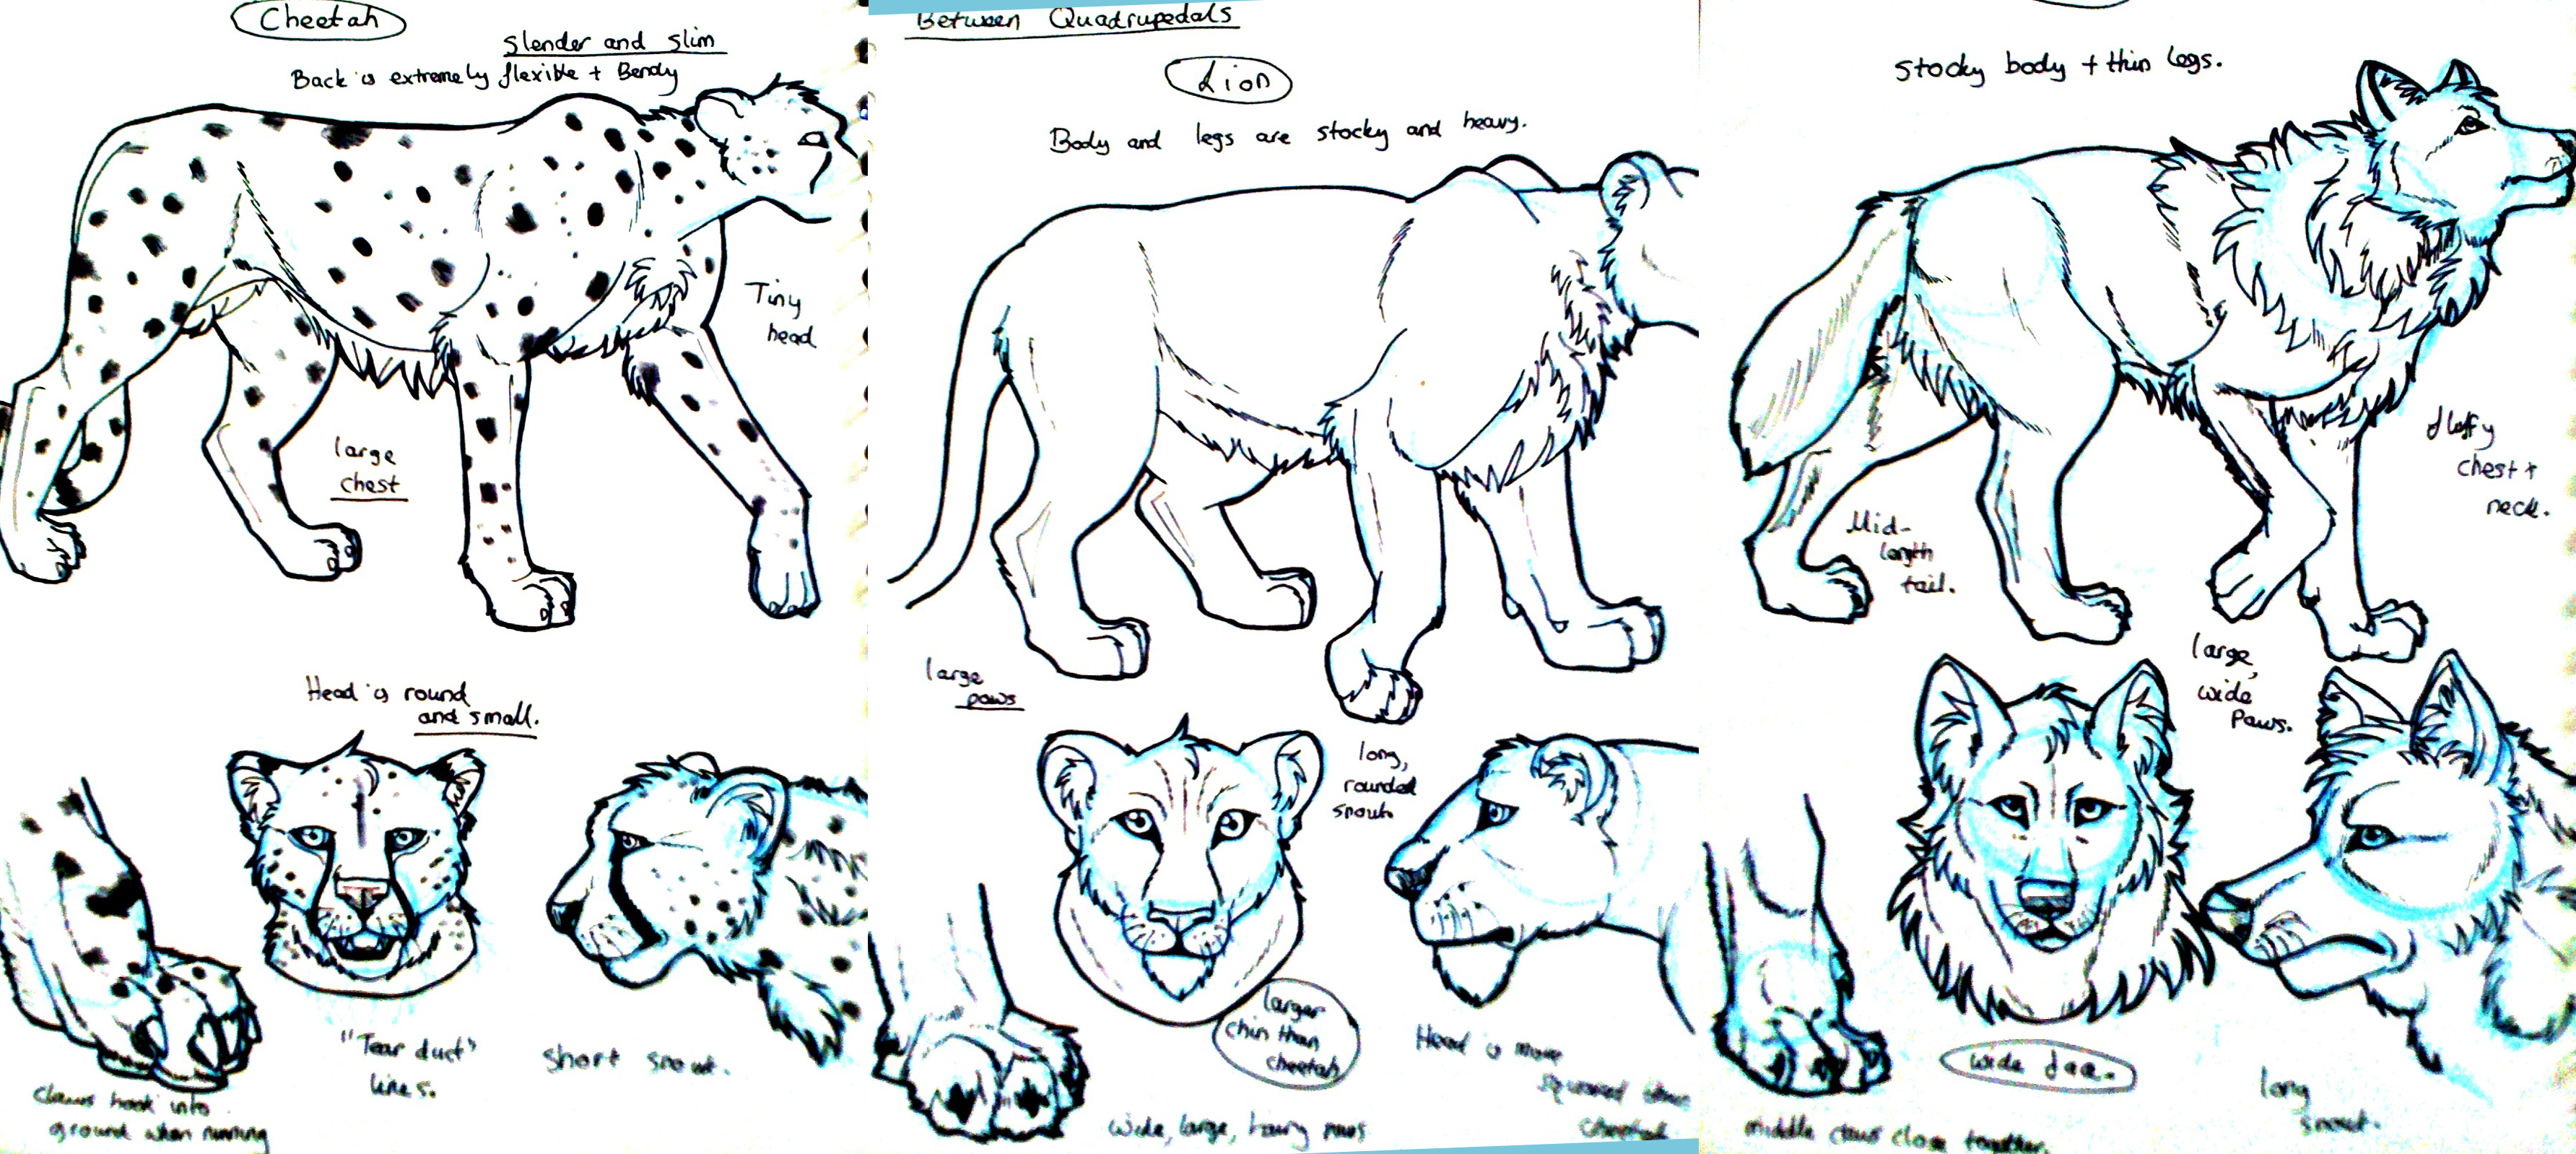 Wolf, cheetah, lion studies by Gashu-Monsata